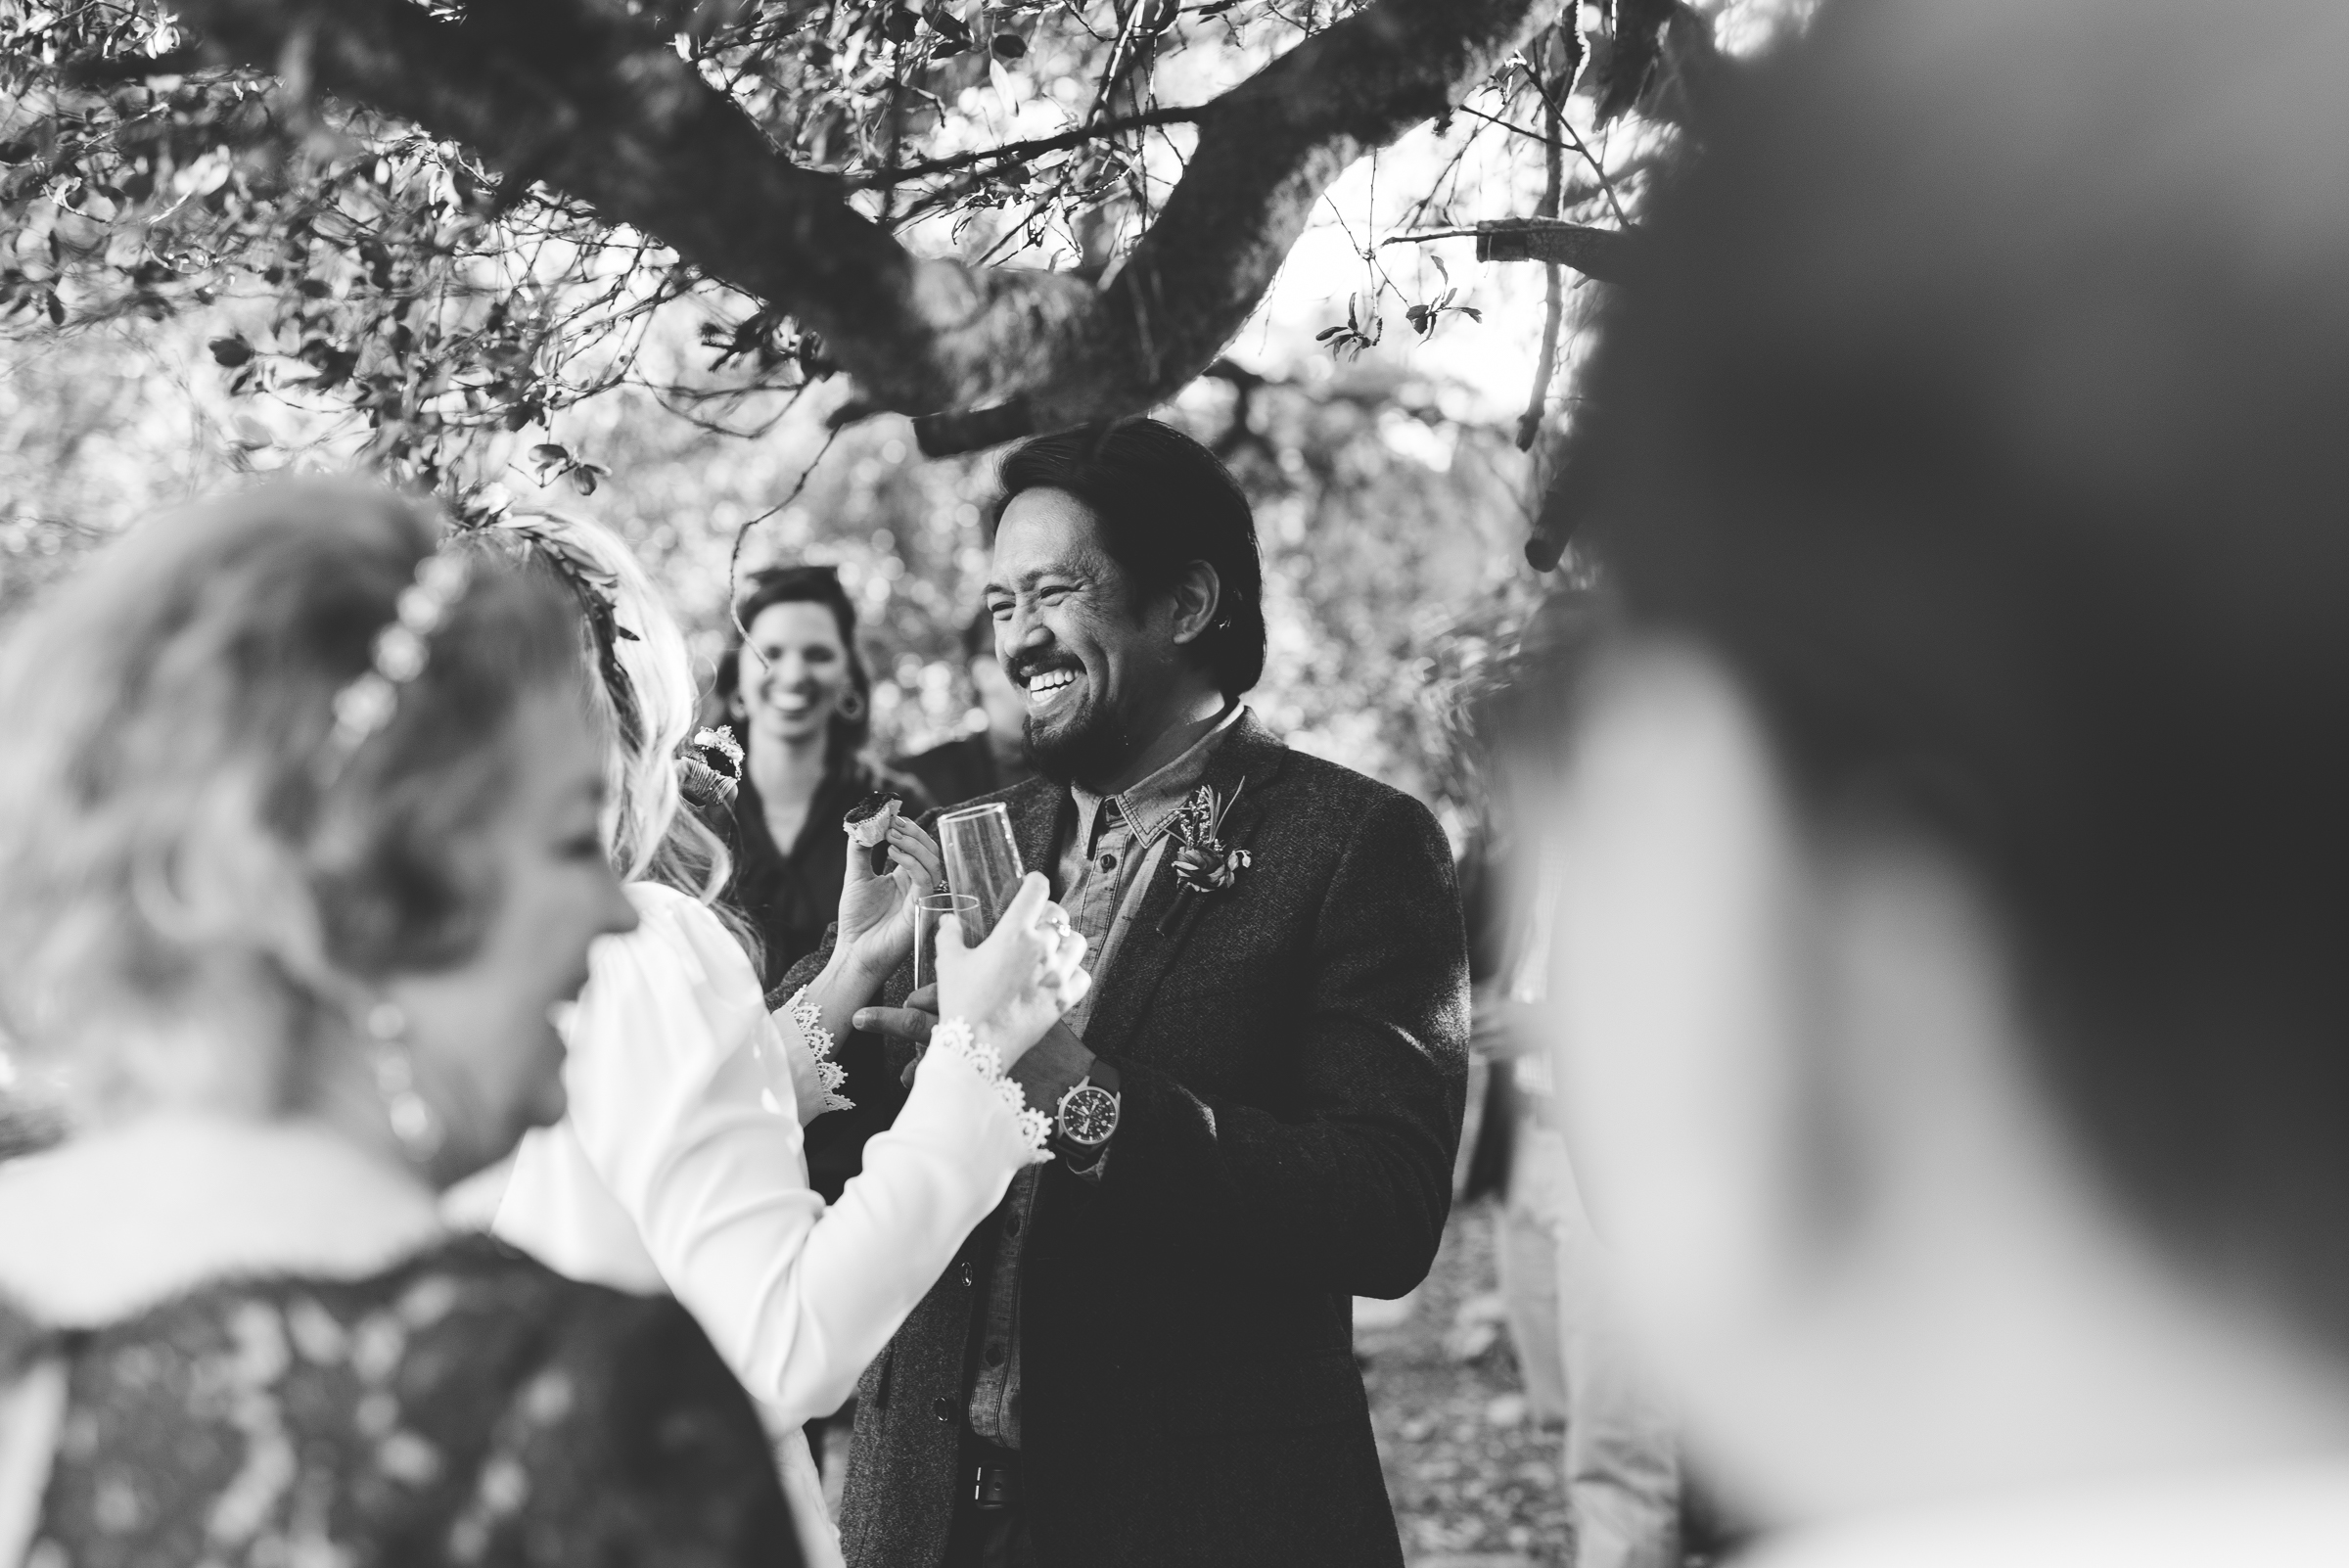 ©Isaiah + Taylor Photography - Intimate Elopement, Eaton Canyon, Los Angeles Wedding Photographer-49.jpg